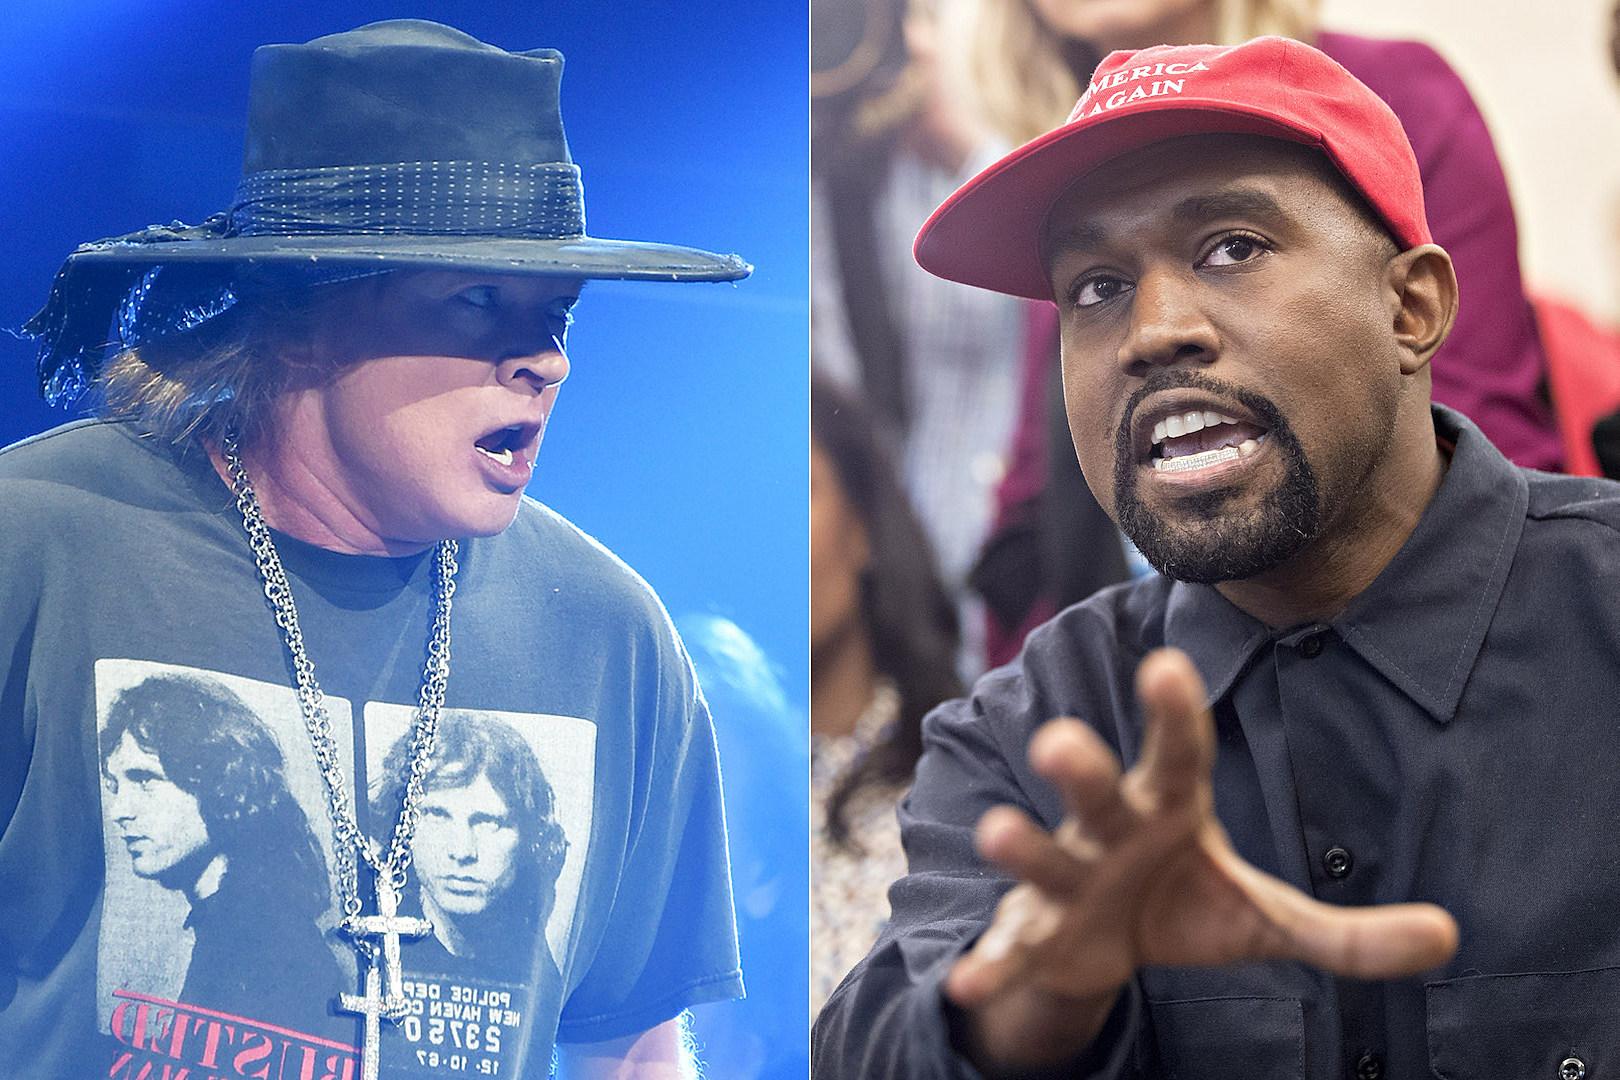 Axl Rose Destroys Kanye West's 'Joke' Meeting With President Trump